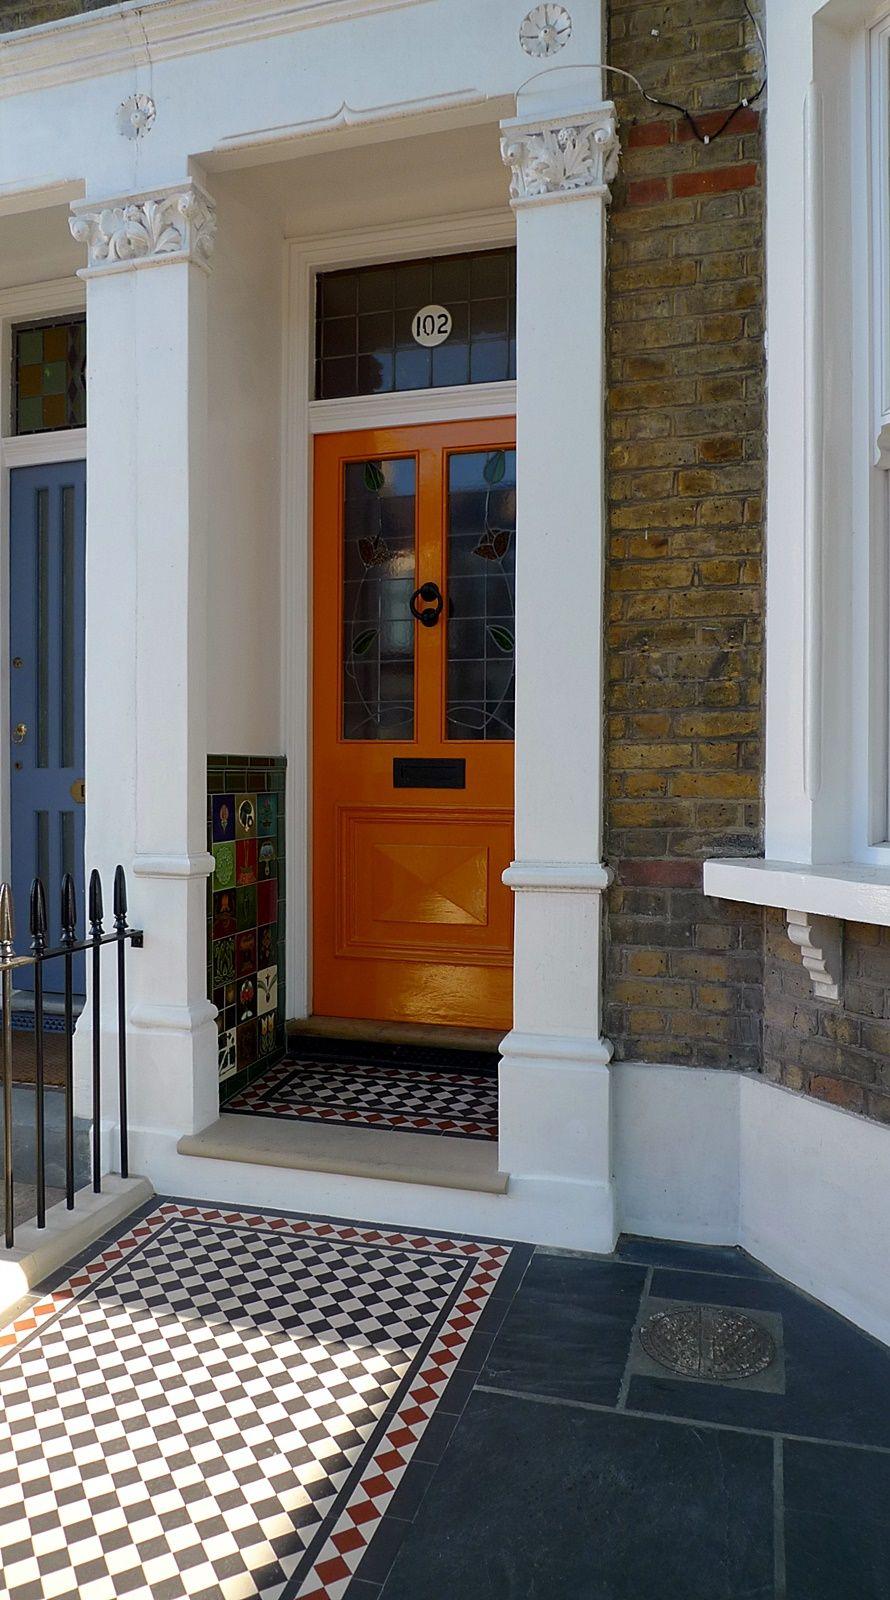 Balham London Tom Howard Gardens: Wrought Iron Rail And Gate Yellow Stock Brick Wall